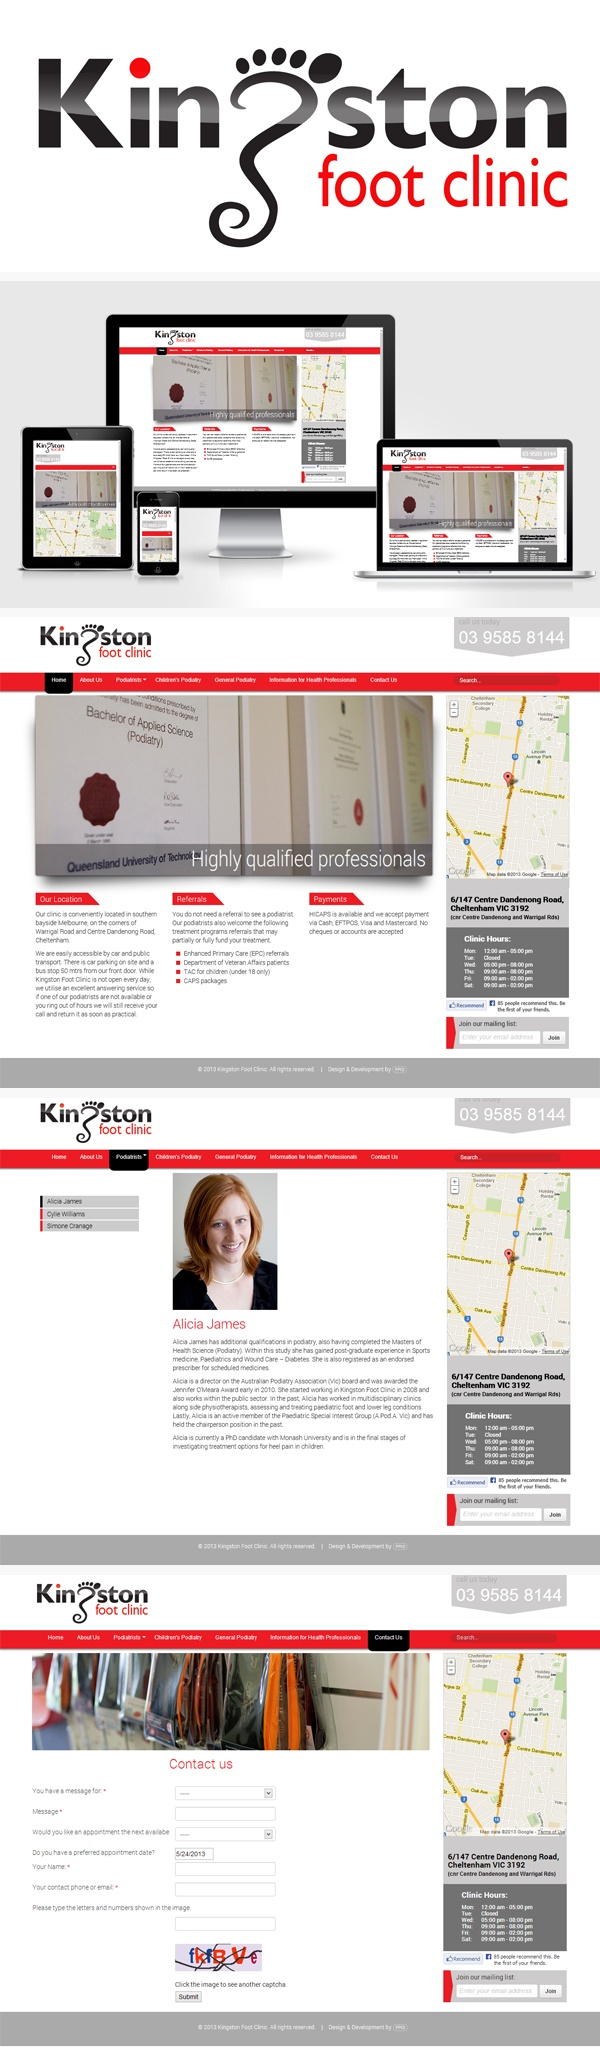 Kingston Foot Clinic on Behance